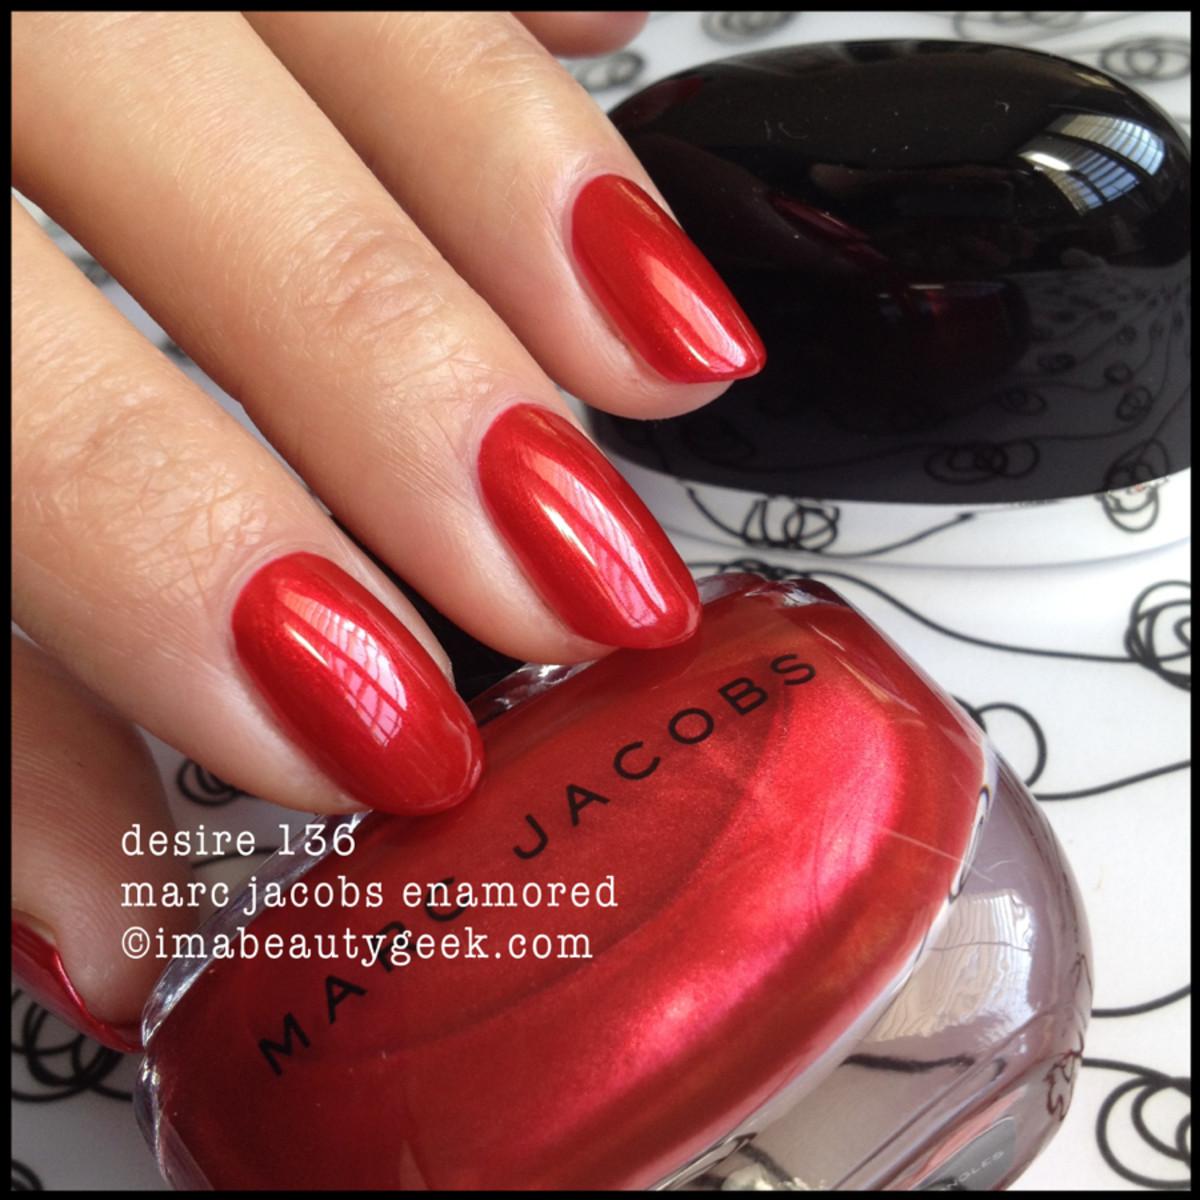 Marc Jacobs Enamored Desire 136